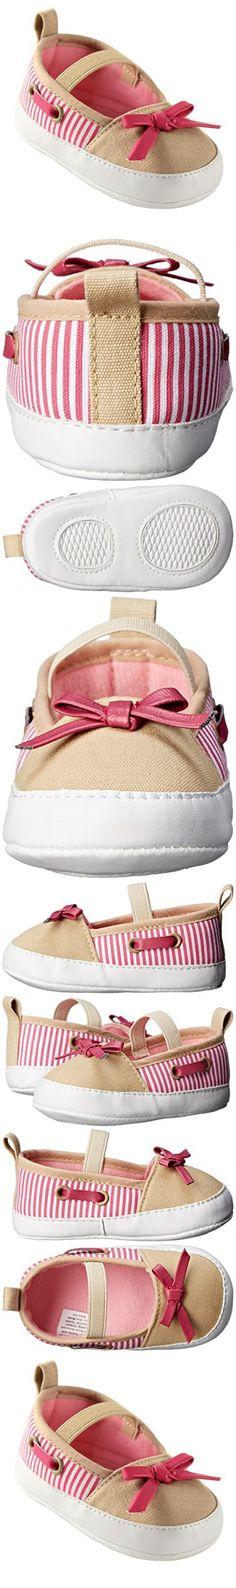 Luvable Friends Girls Boat Shoes (Infant), Beige/Pink, 0-6 Months M US Infant